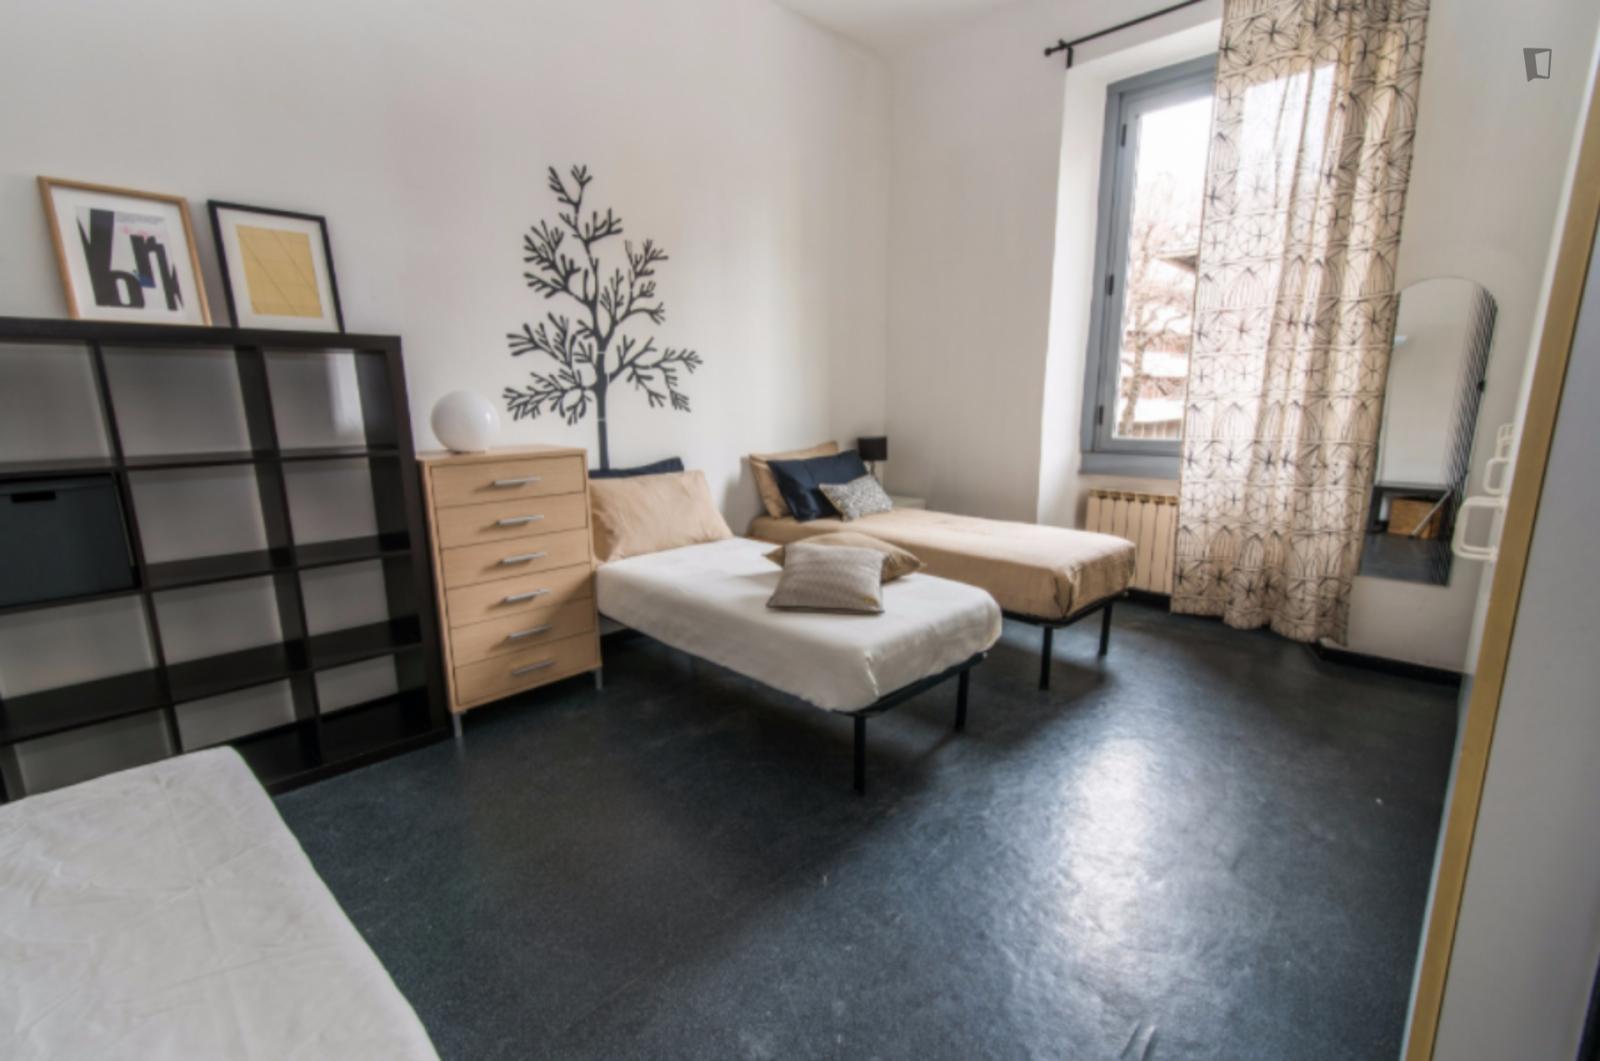 Via Eugenio Villoresi, Milan, TN - 1,500 USD/ month